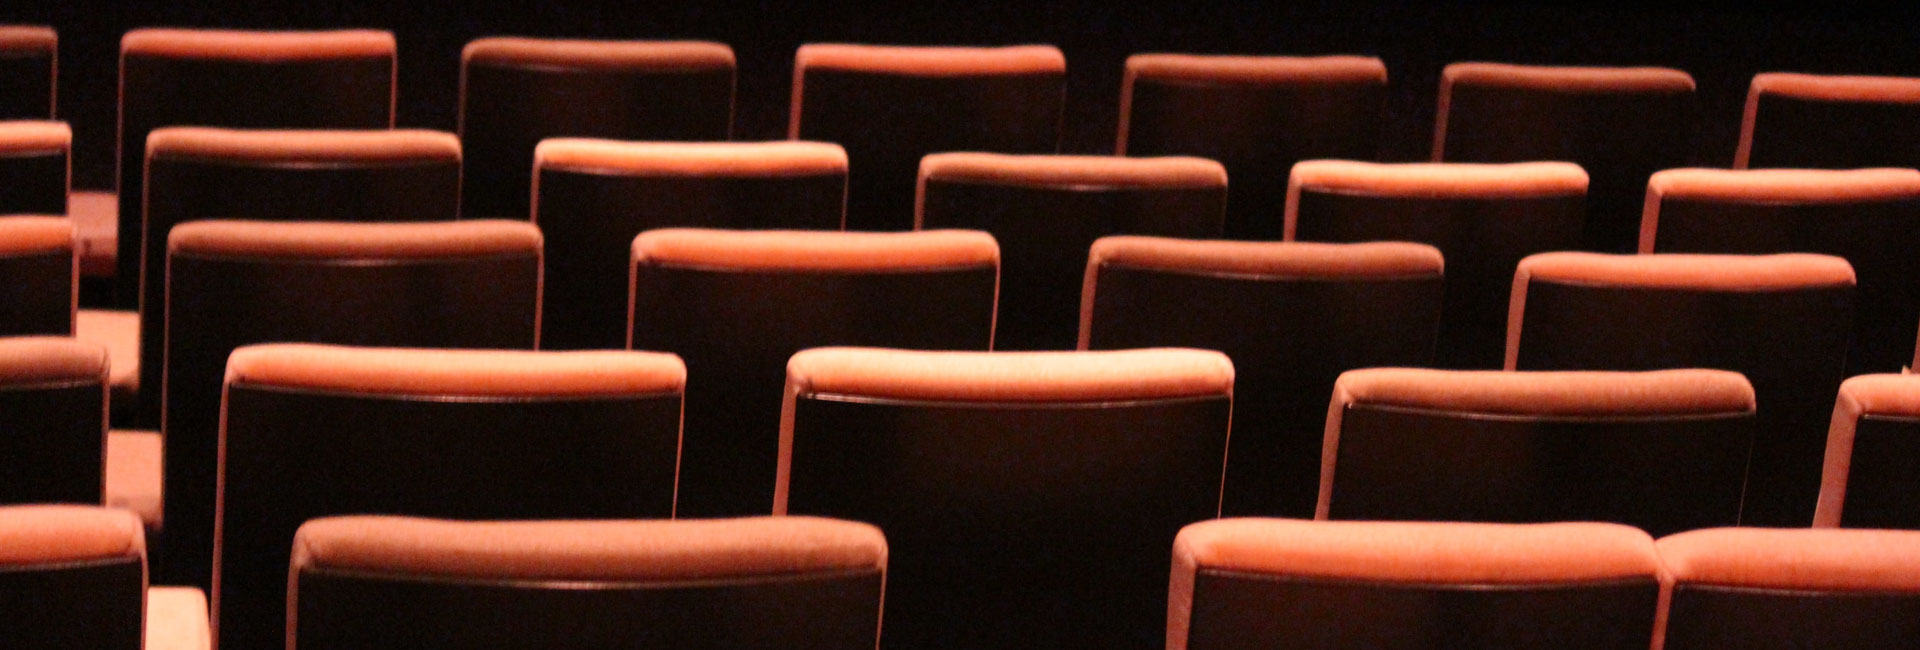 Ramses Shaffy Huis culturele agenda verwacht